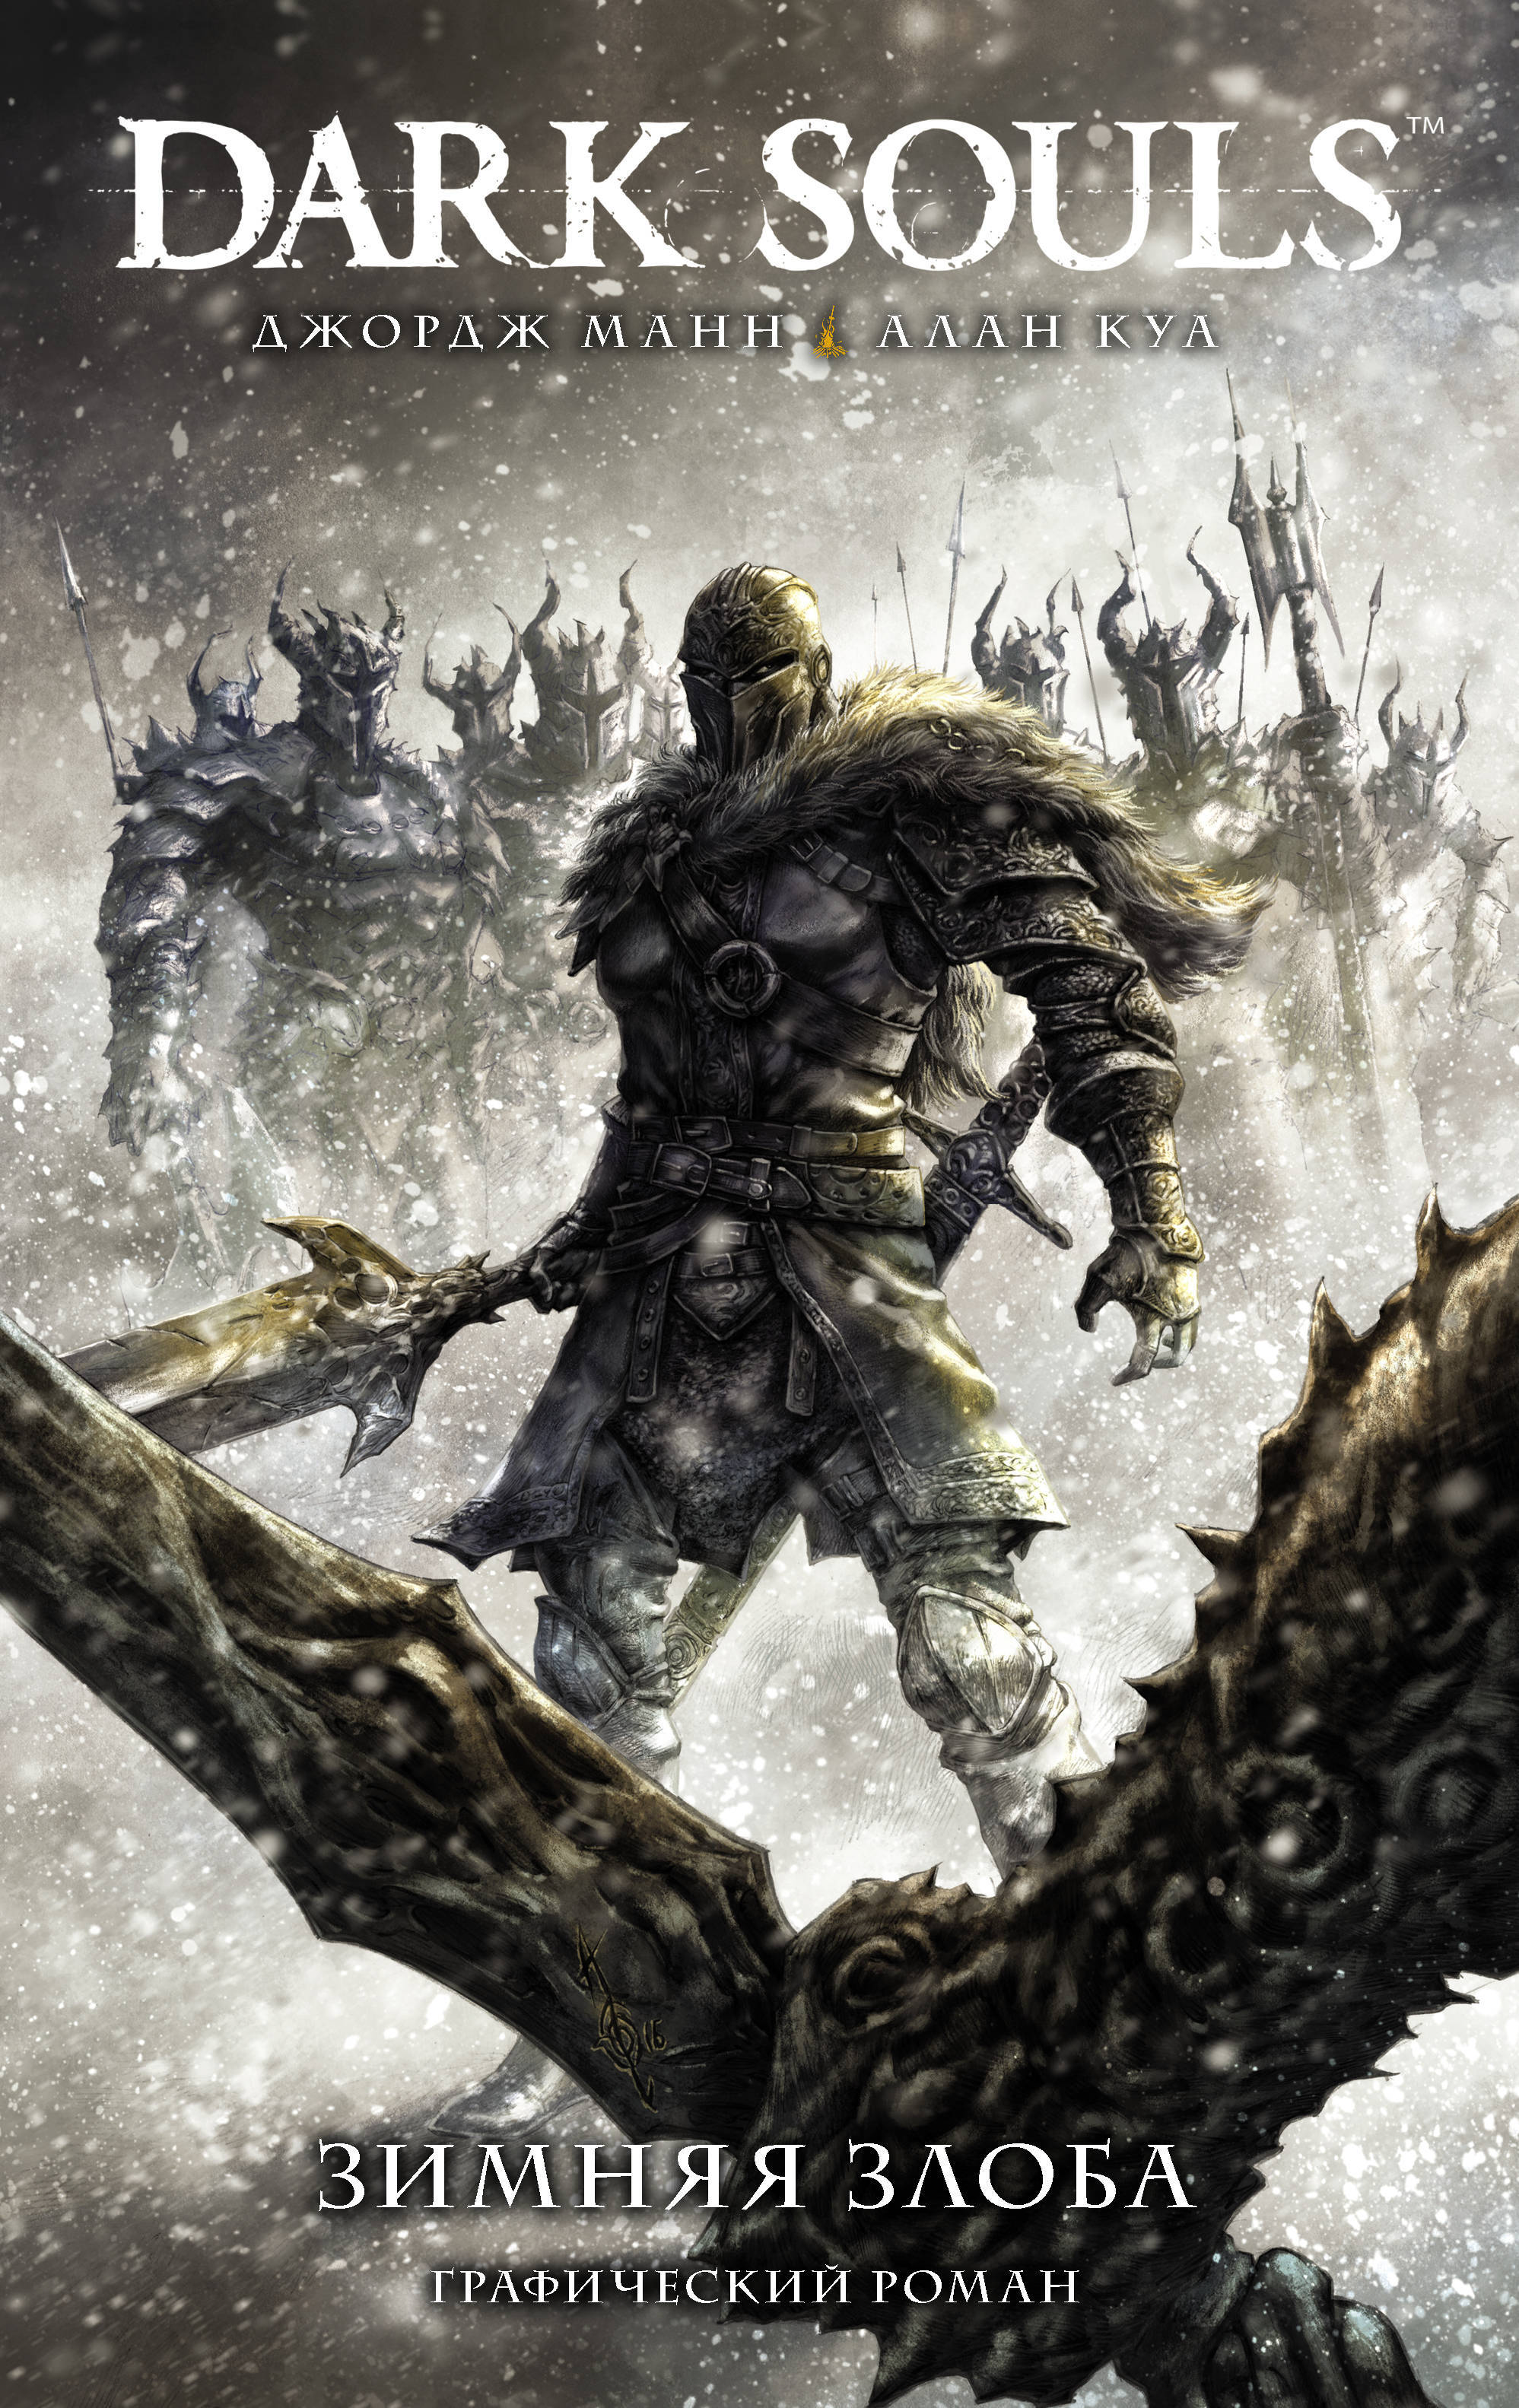 Dark Souls. Зимняя злоба | Манн Джордж